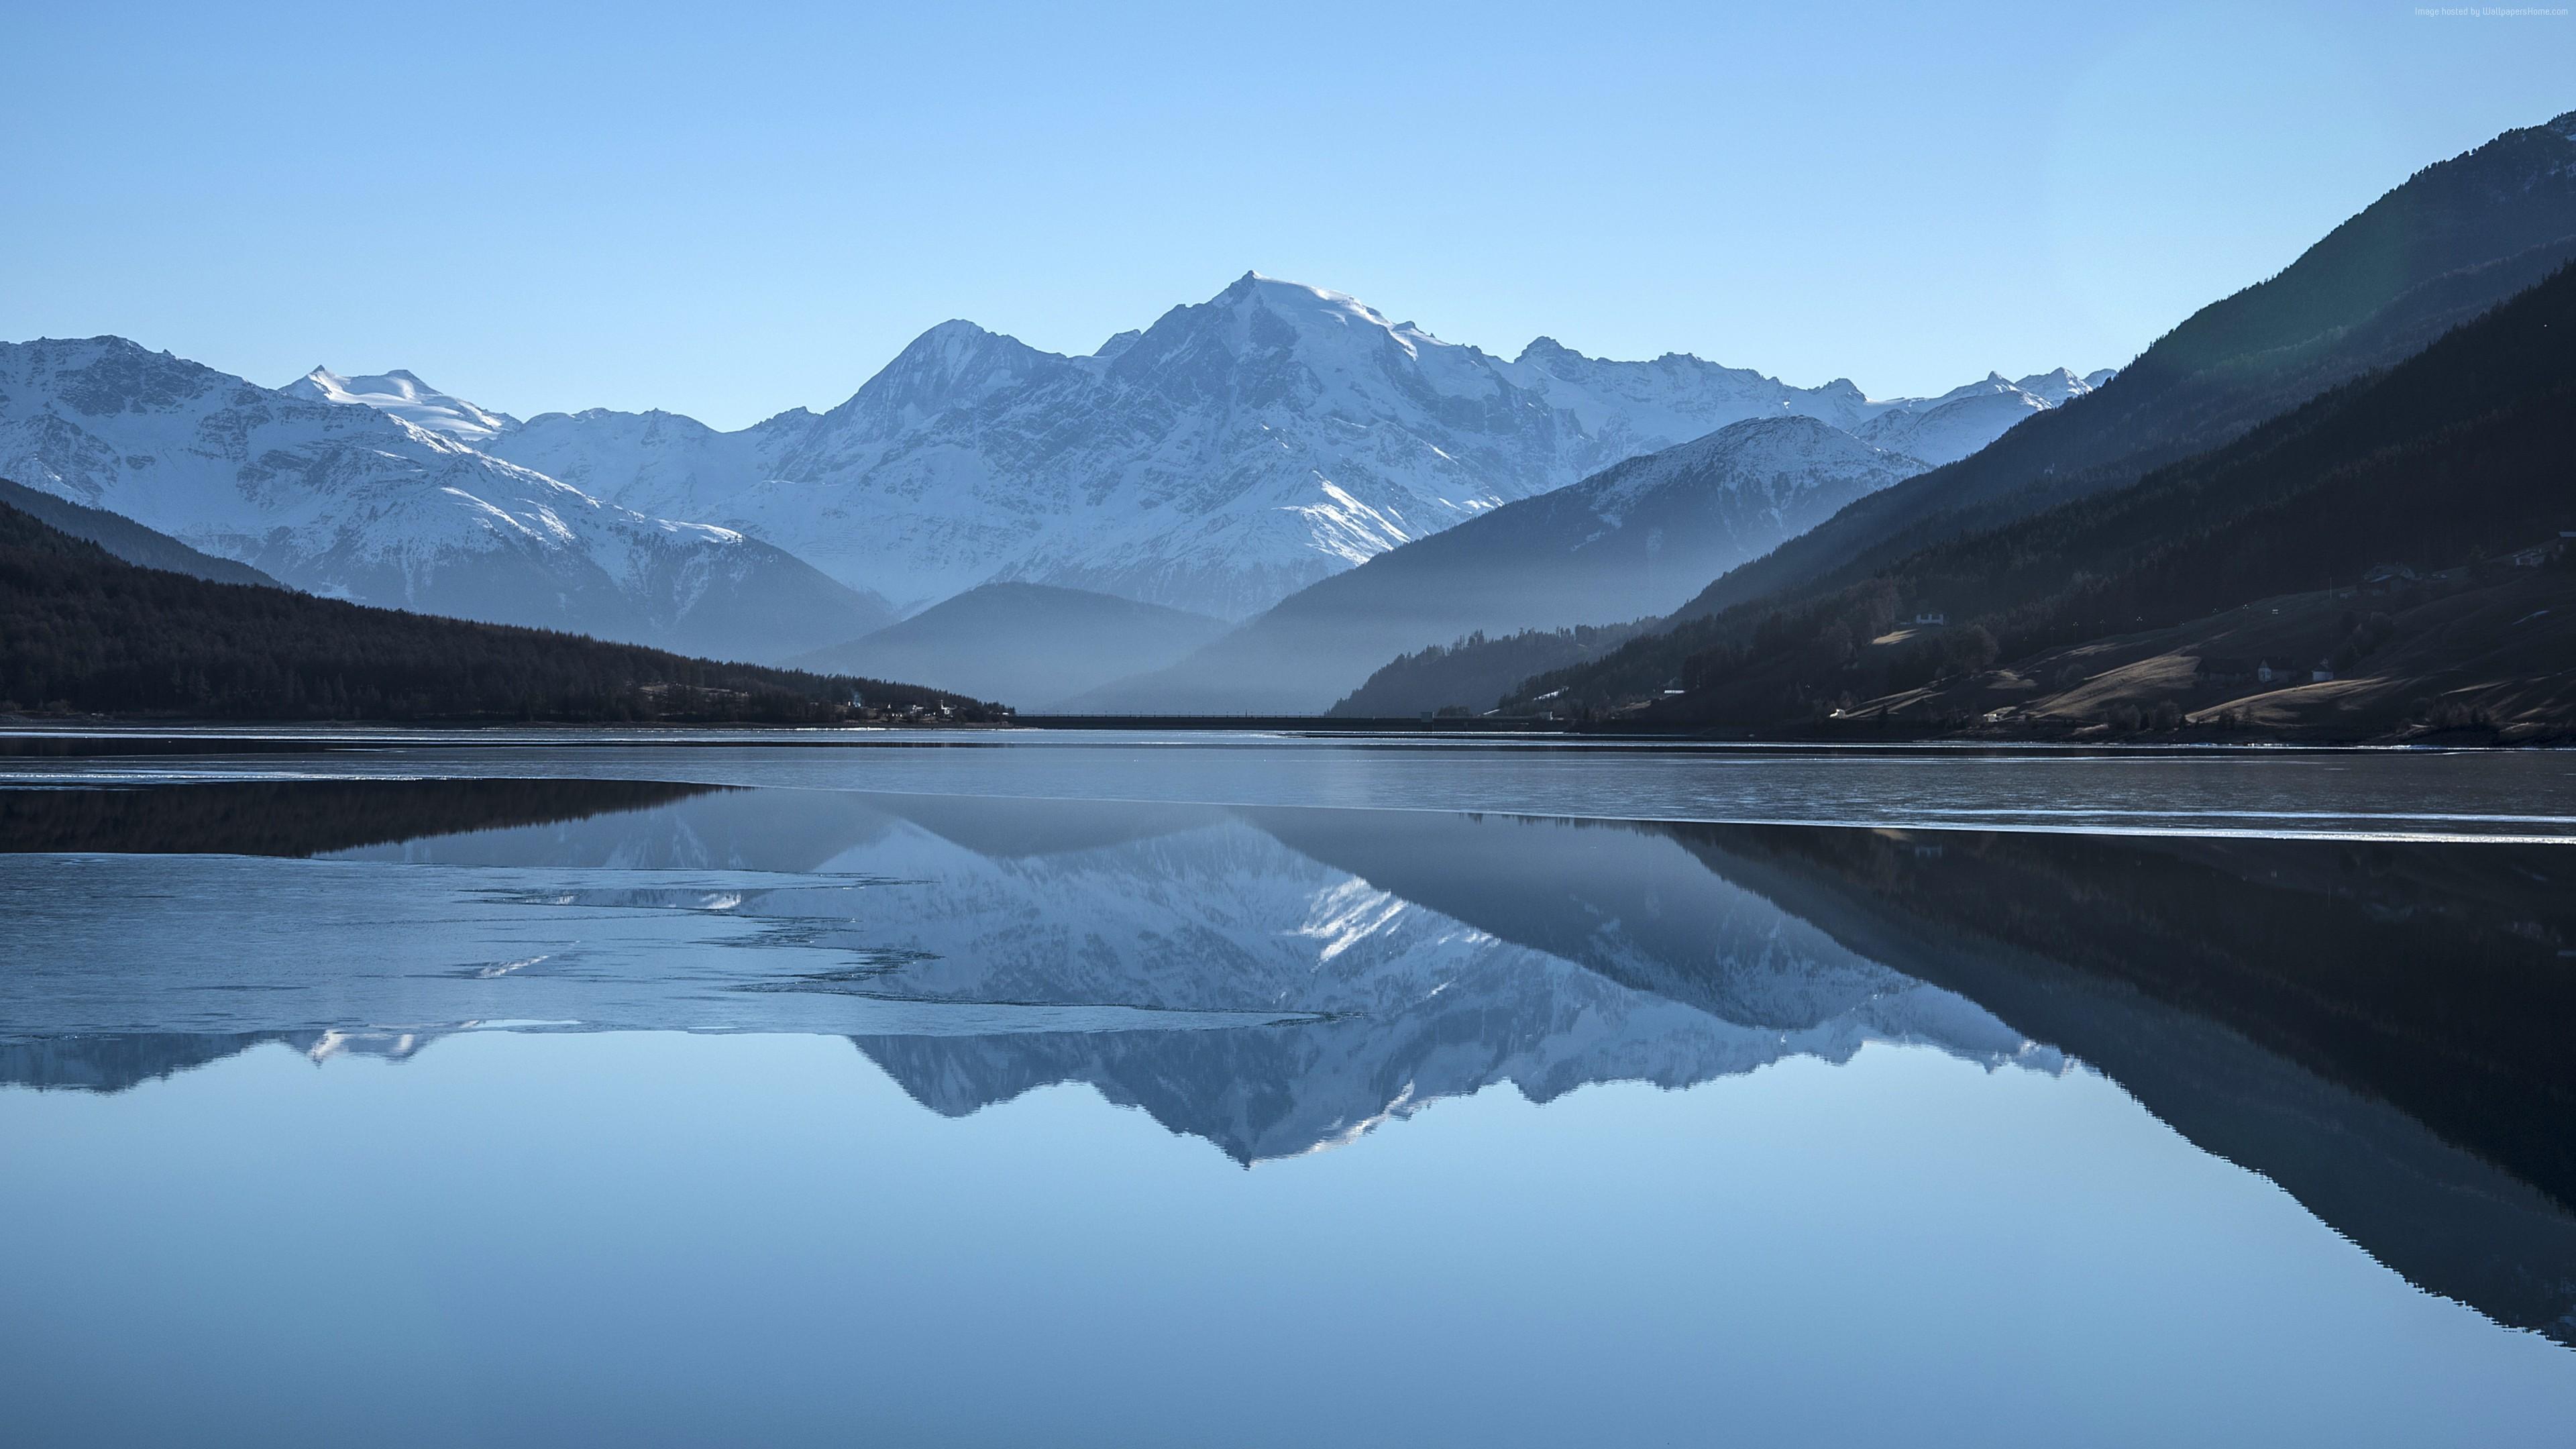 Wallpaper Mountains Lake 5k Nature Wallpaper Download High Resolution 4k Wallpaper